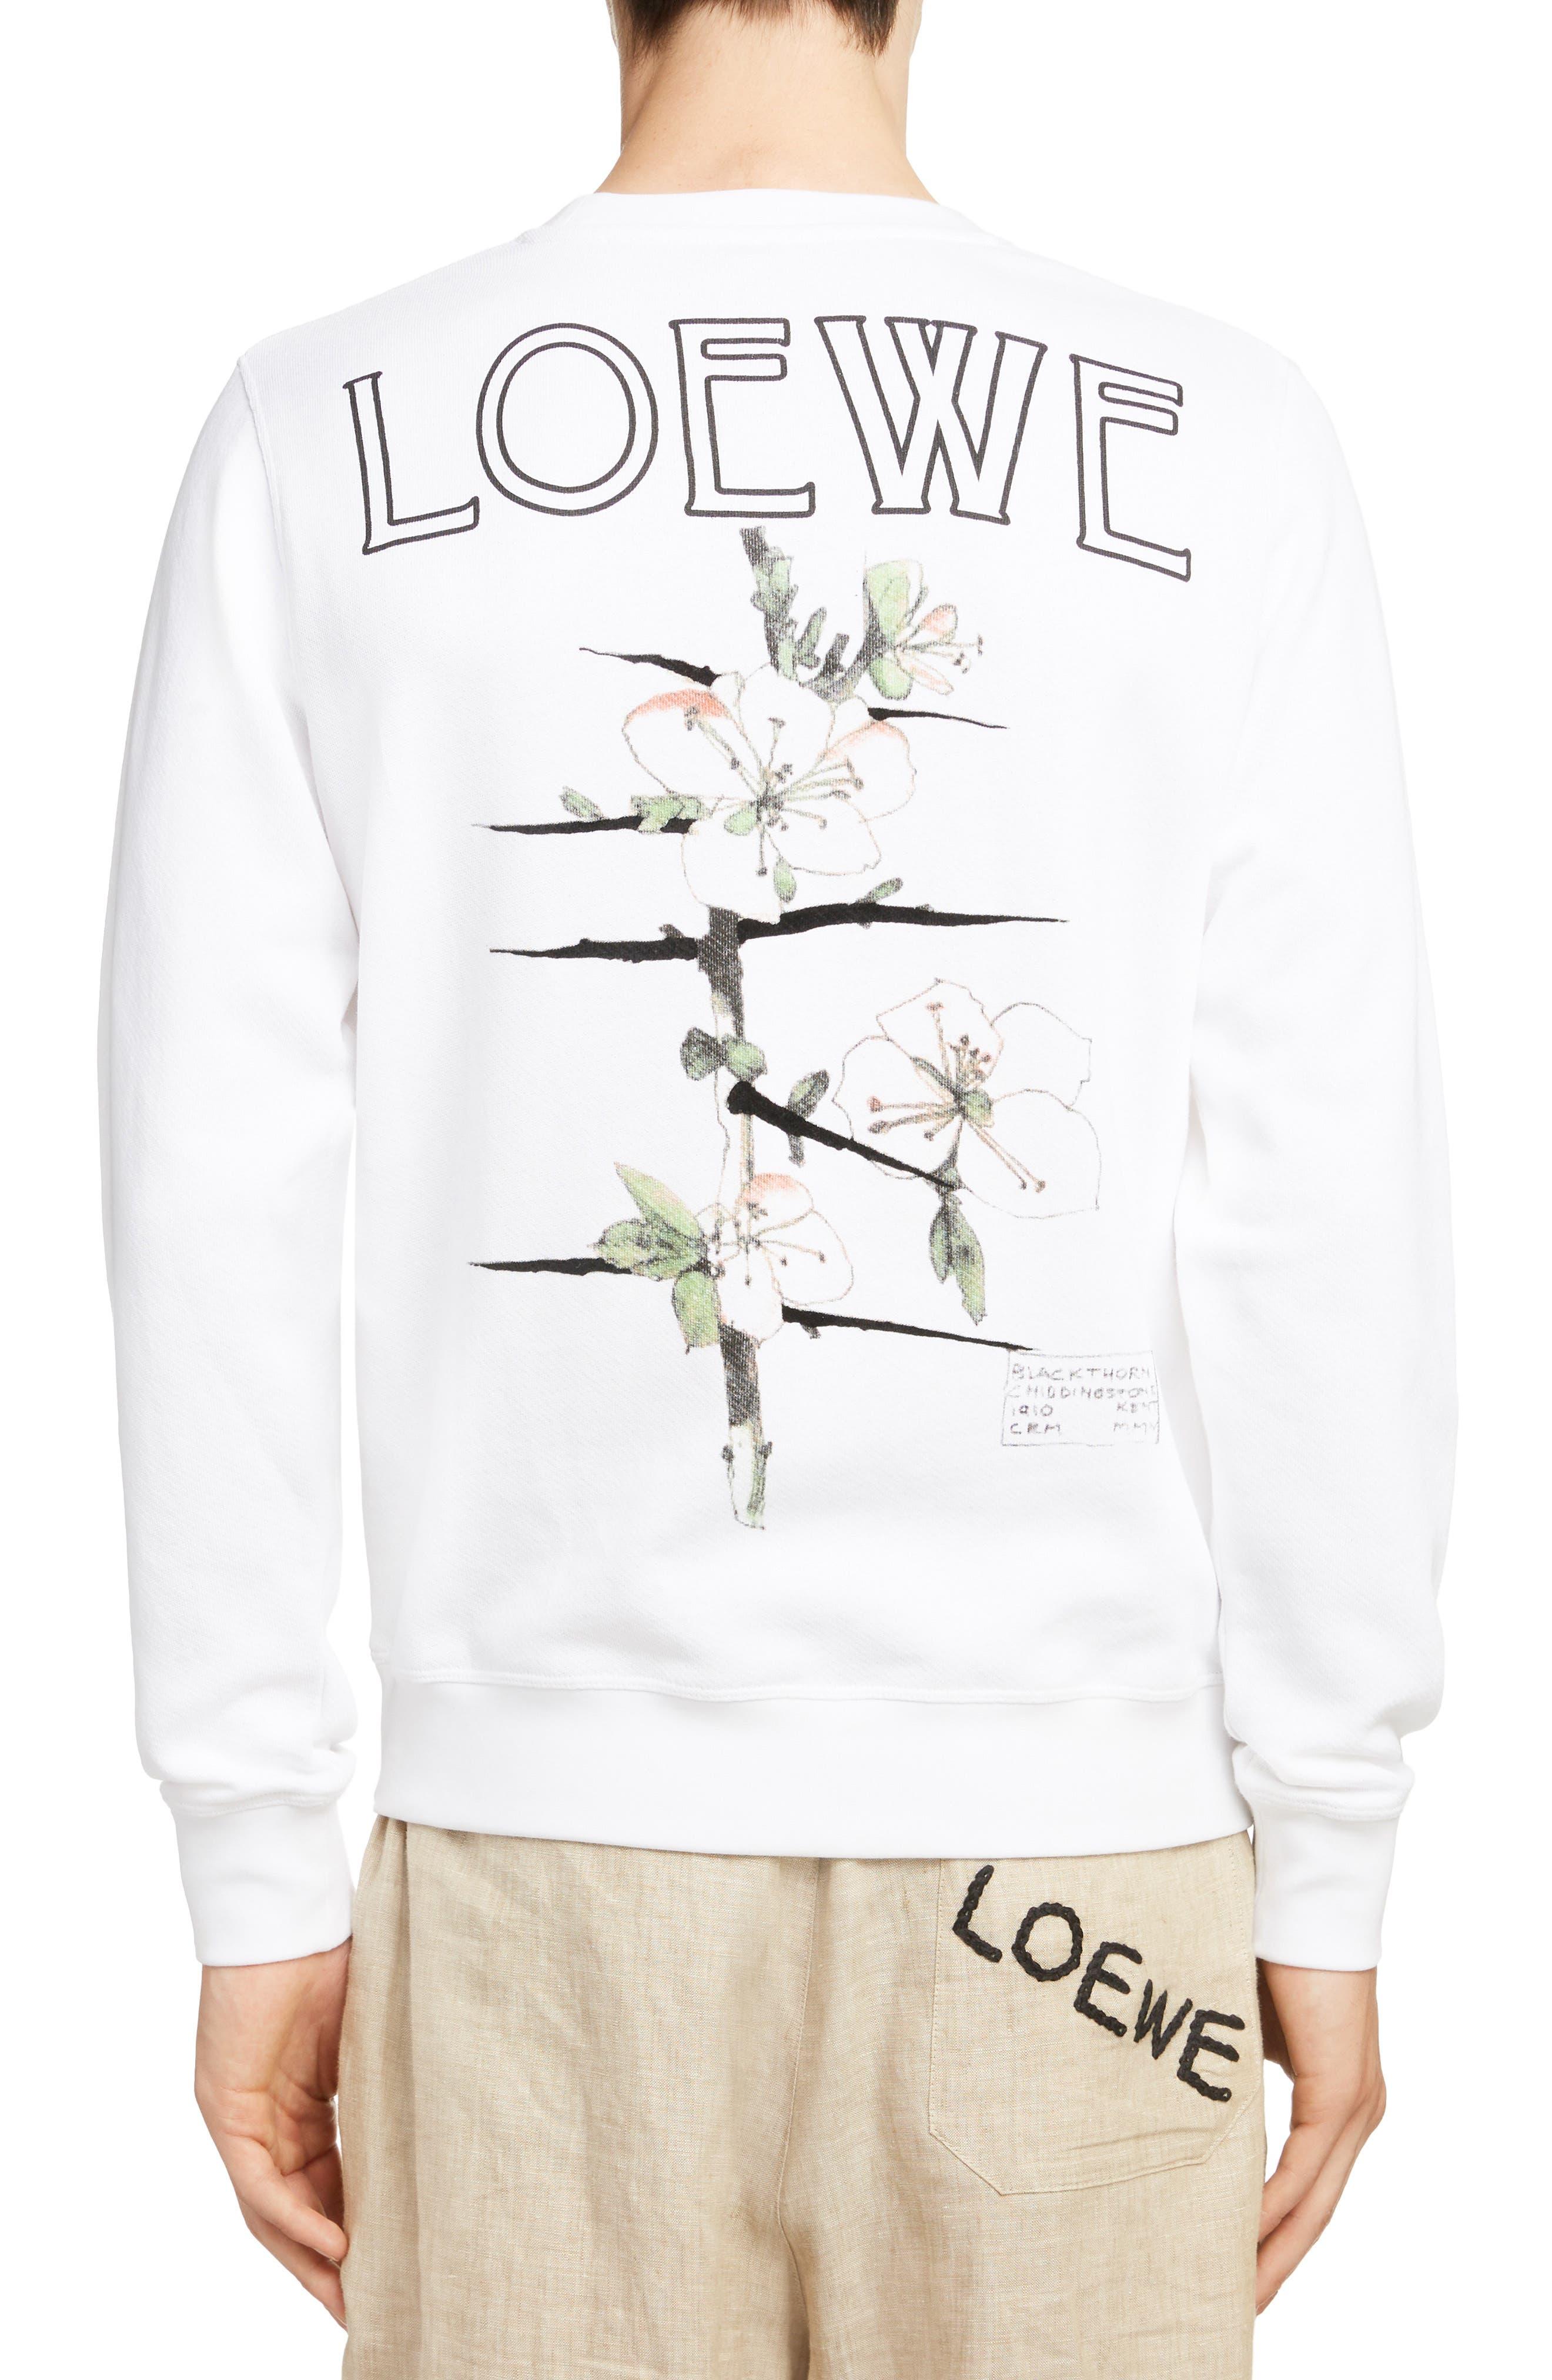 LOEWE, Charles Rennie Mackintosh Collection Botanical Print Sweatshirt, Alternate thumbnail 2, color, 2100-WHITE